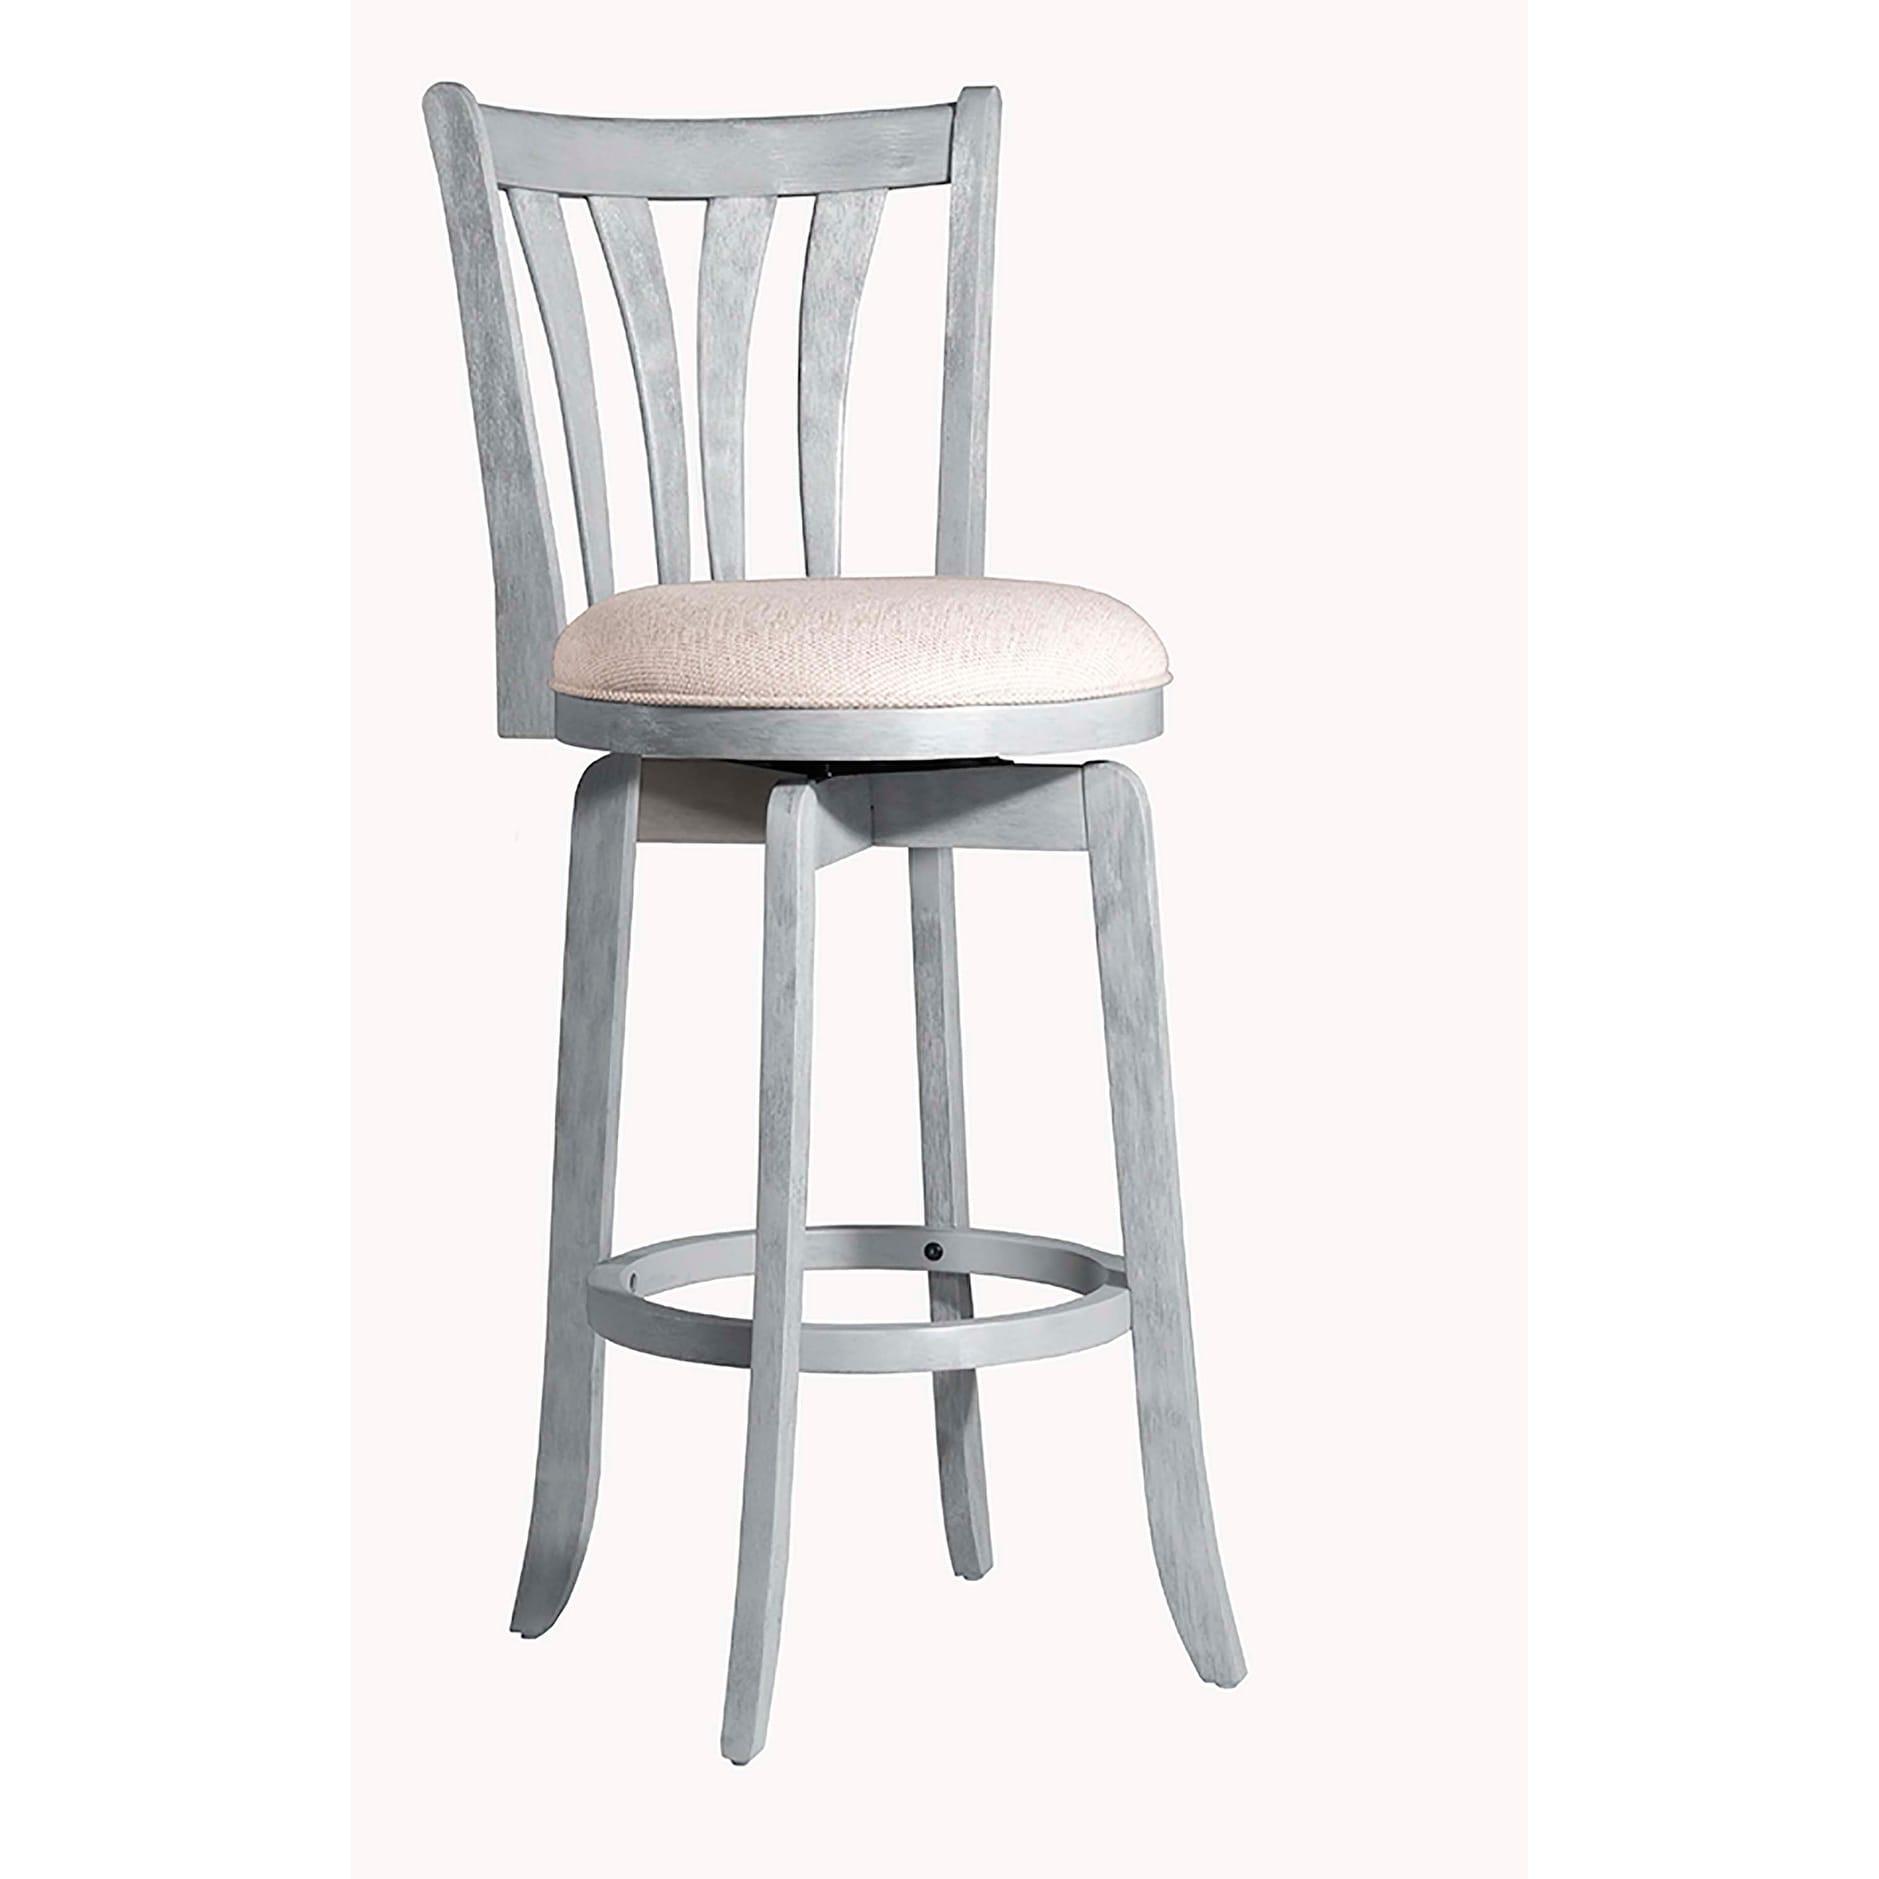 Miraculous Hillsdale Furniture Savana Swivel Counter Stool Blue 25 75 Creativecarmelina Interior Chair Design Creativecarmelinacom